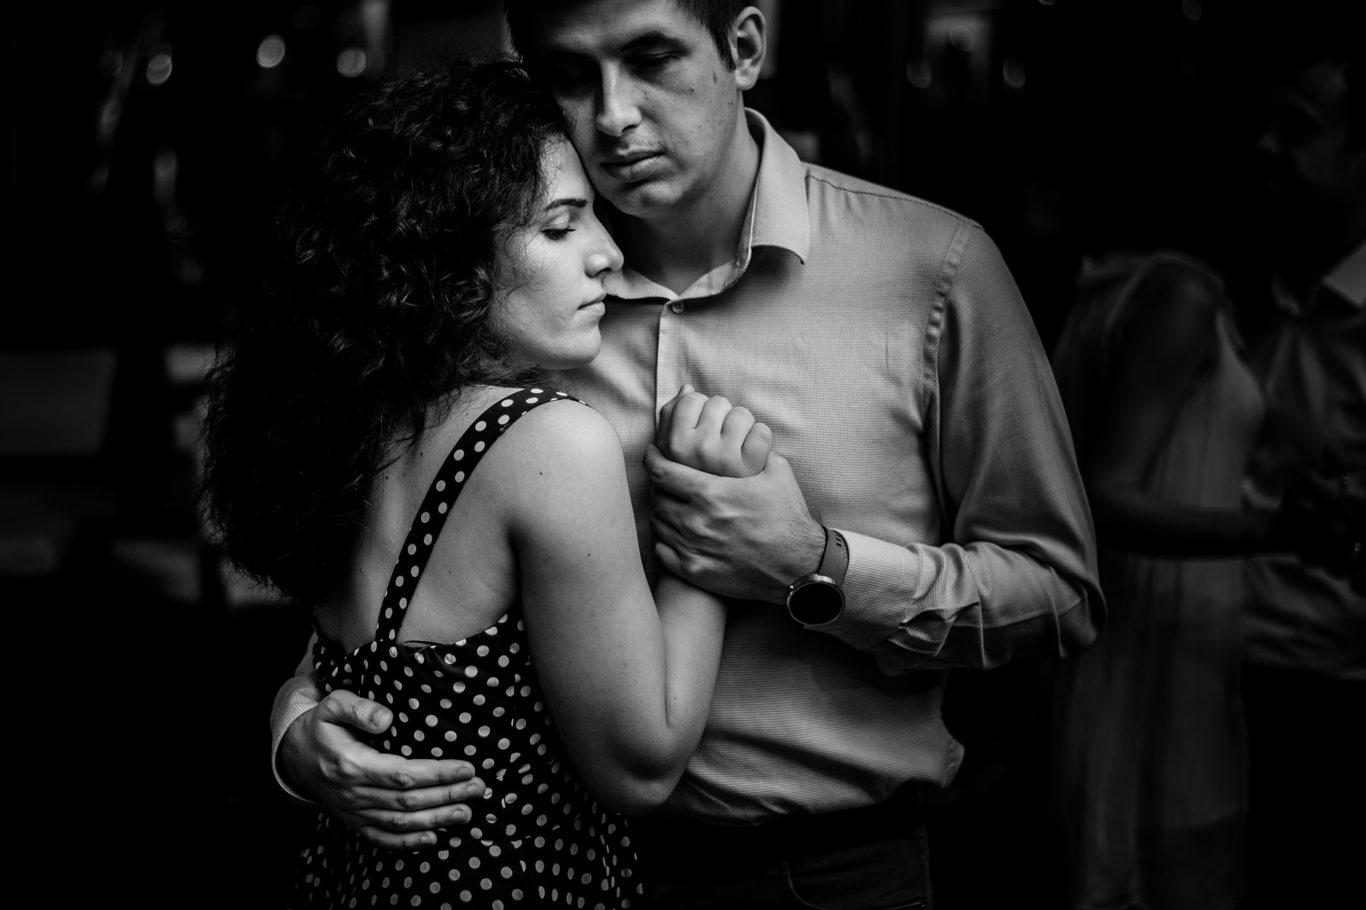 0760-fotografie-nunta-bucuresti-rodica-rares-fotograf-ciprian-dumitrescu-dsc_3791